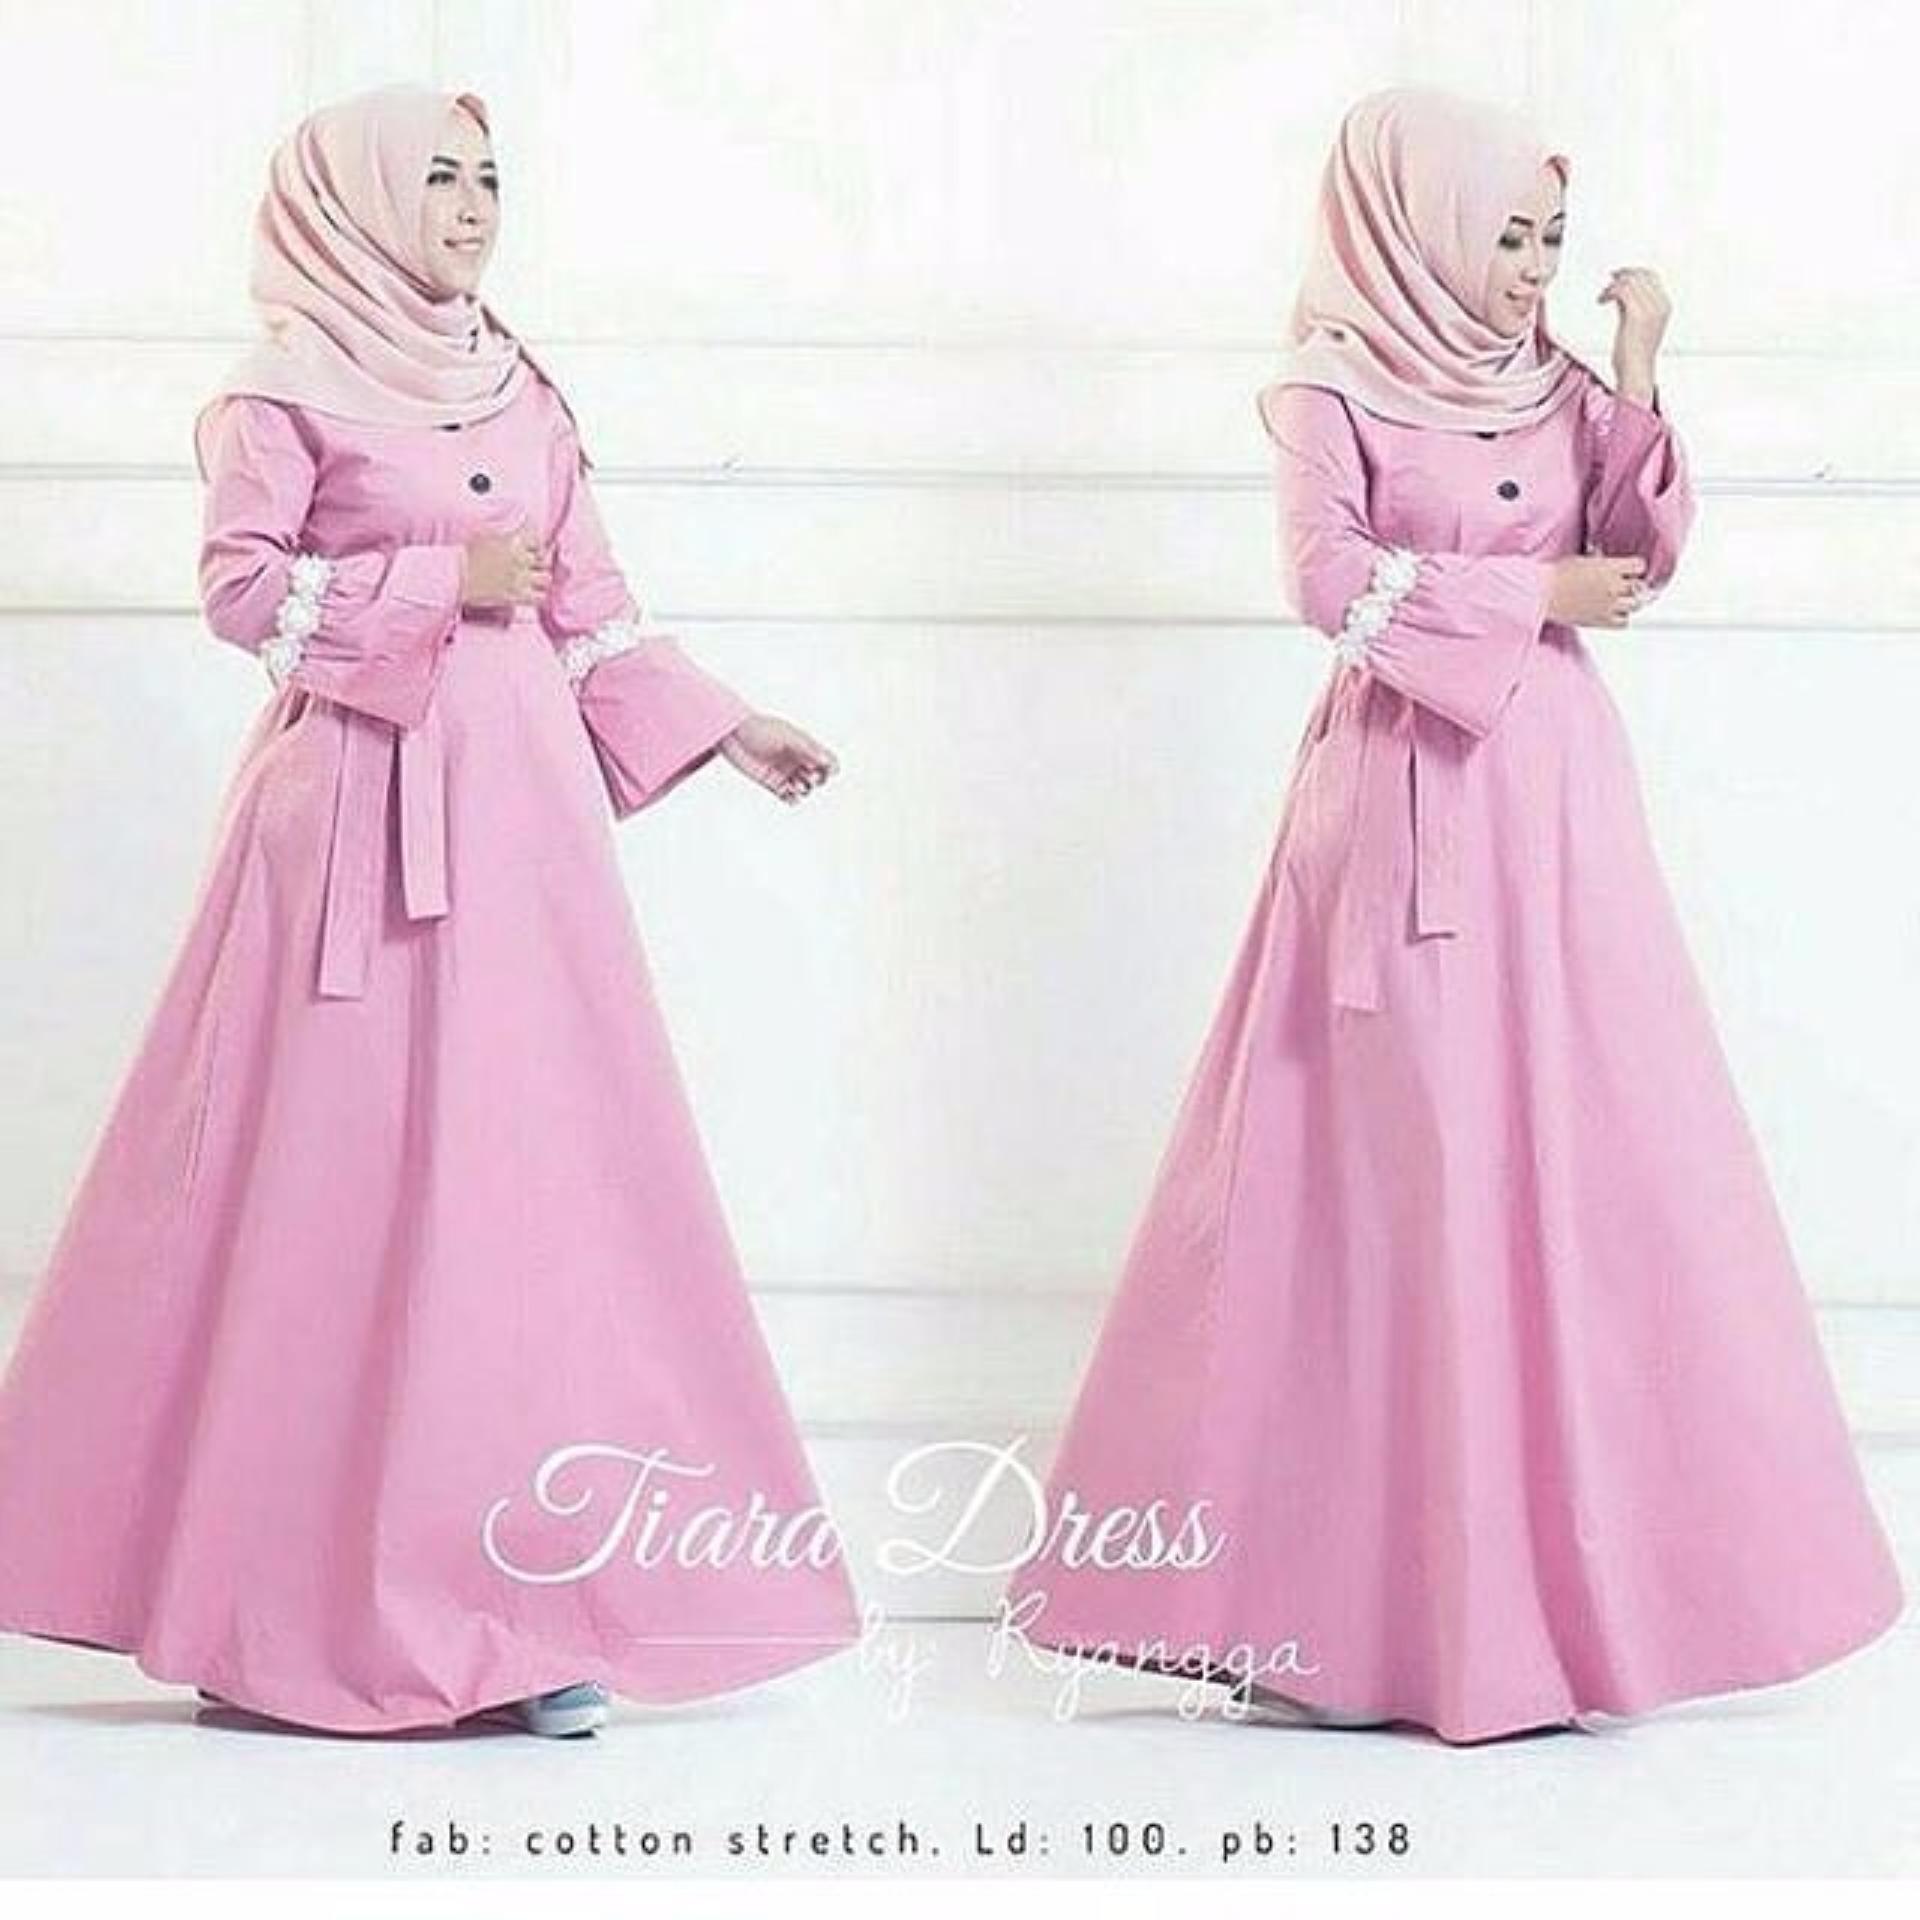 Model Elegan Baju Original Tiara Dress Gamis Wolfice Gaun Pesta Panjang Baju Hijab Terusan Pengajian Wanita Muslimah Warna